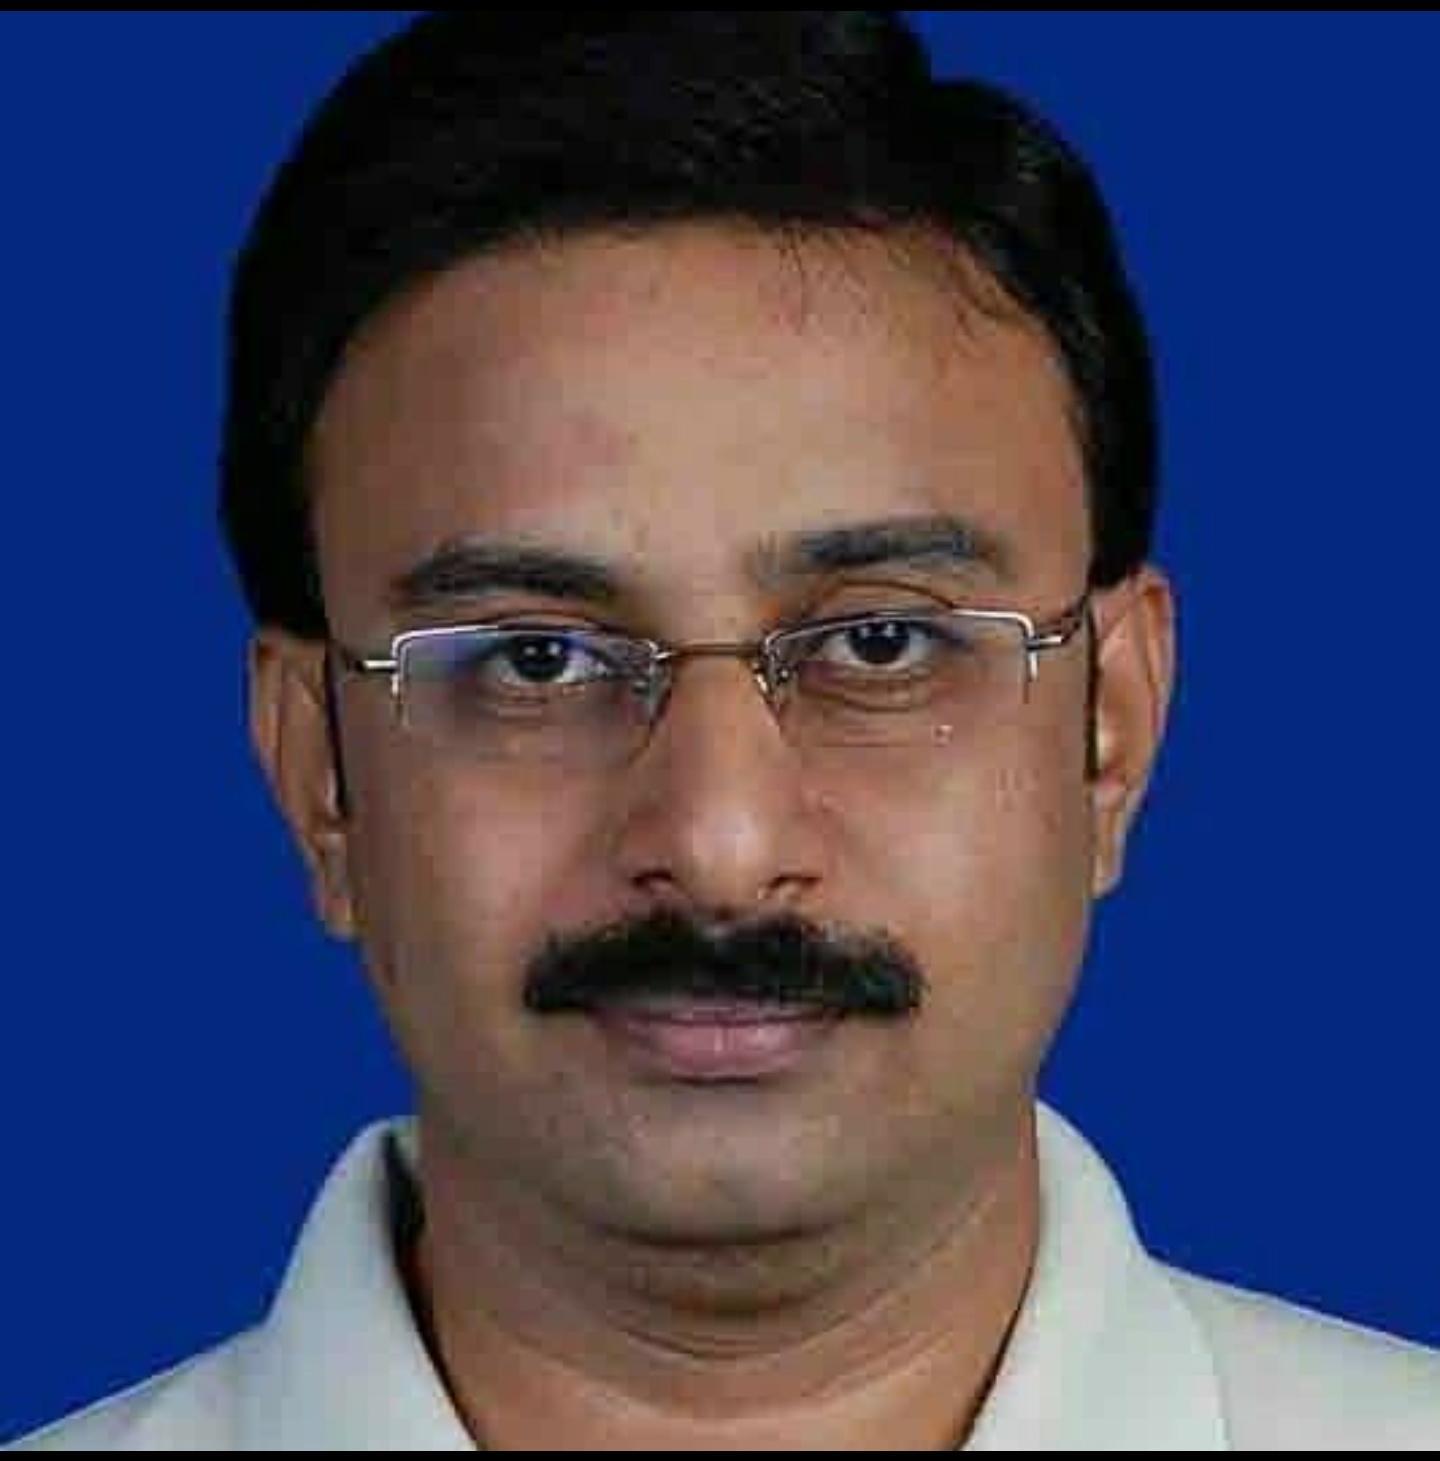 Anadh Parameswaran